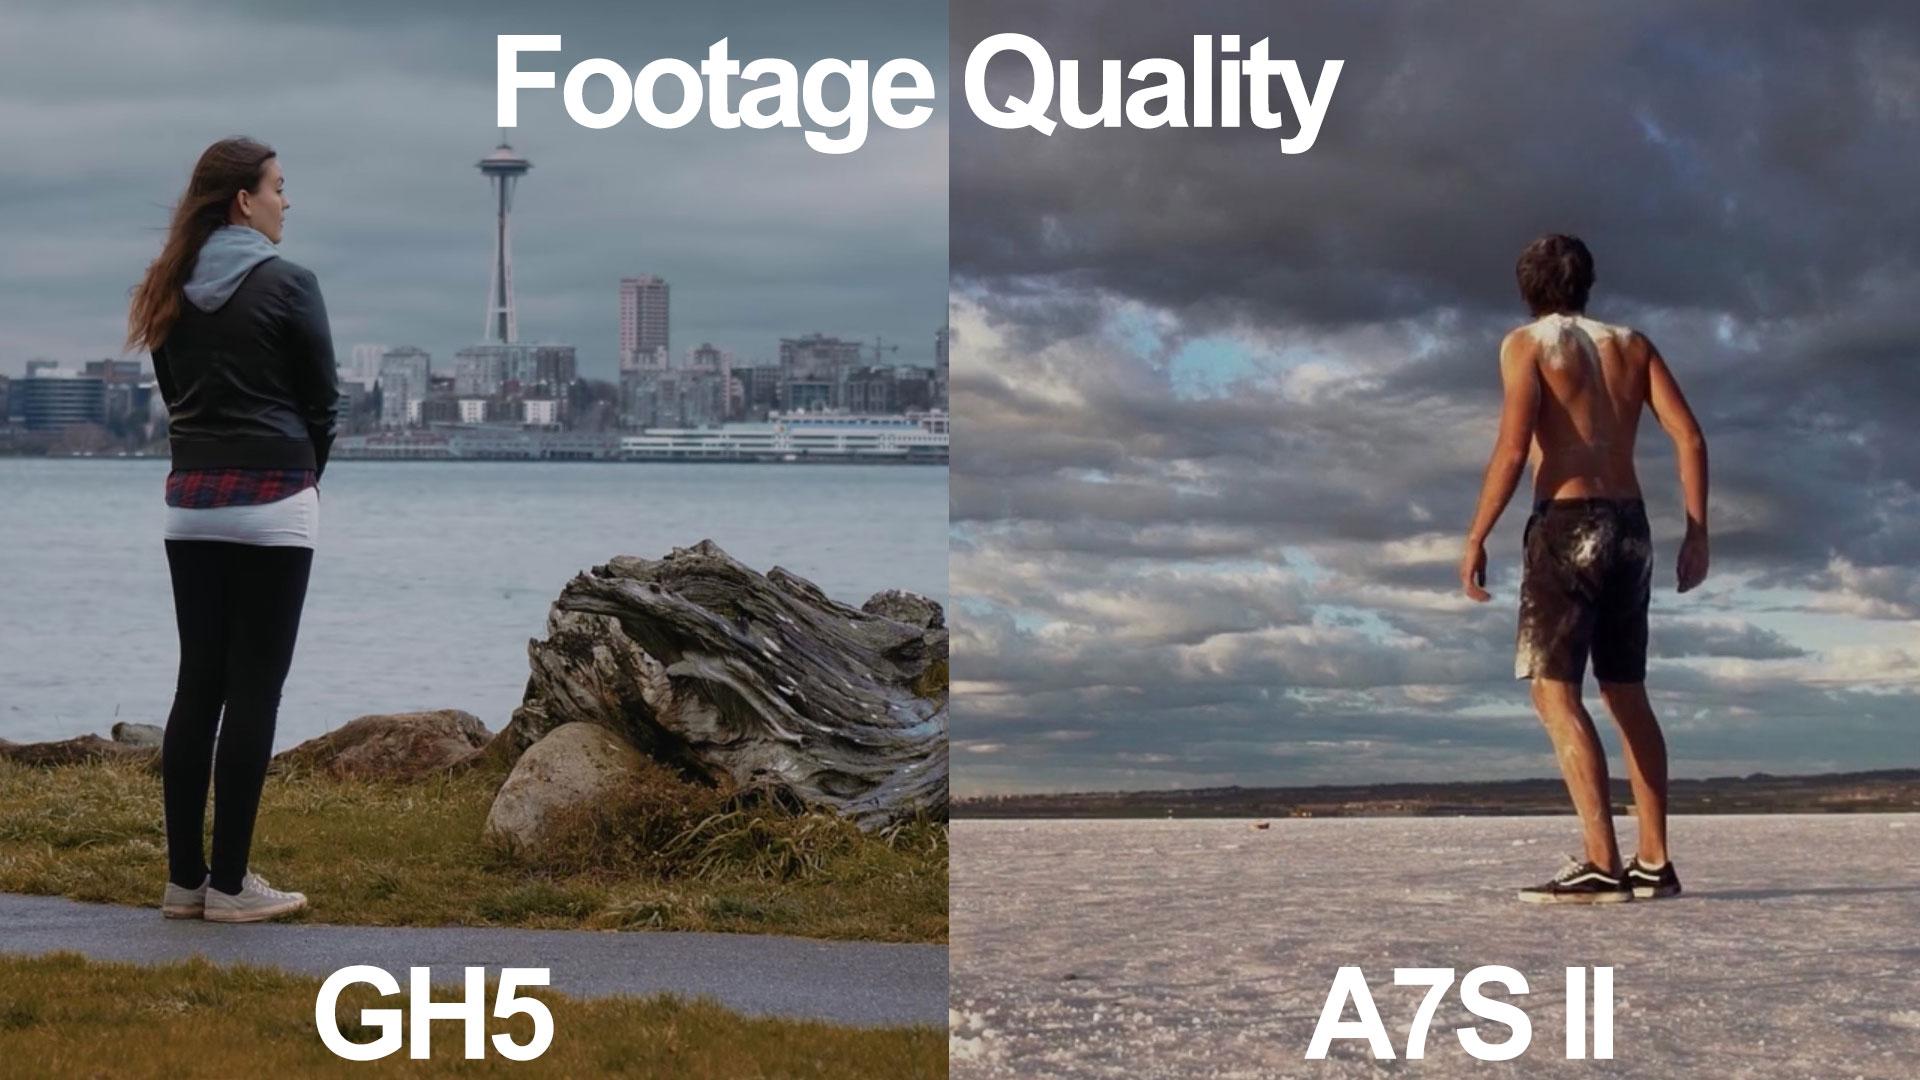 a7s ii gh5 footage quality dynamic range iso